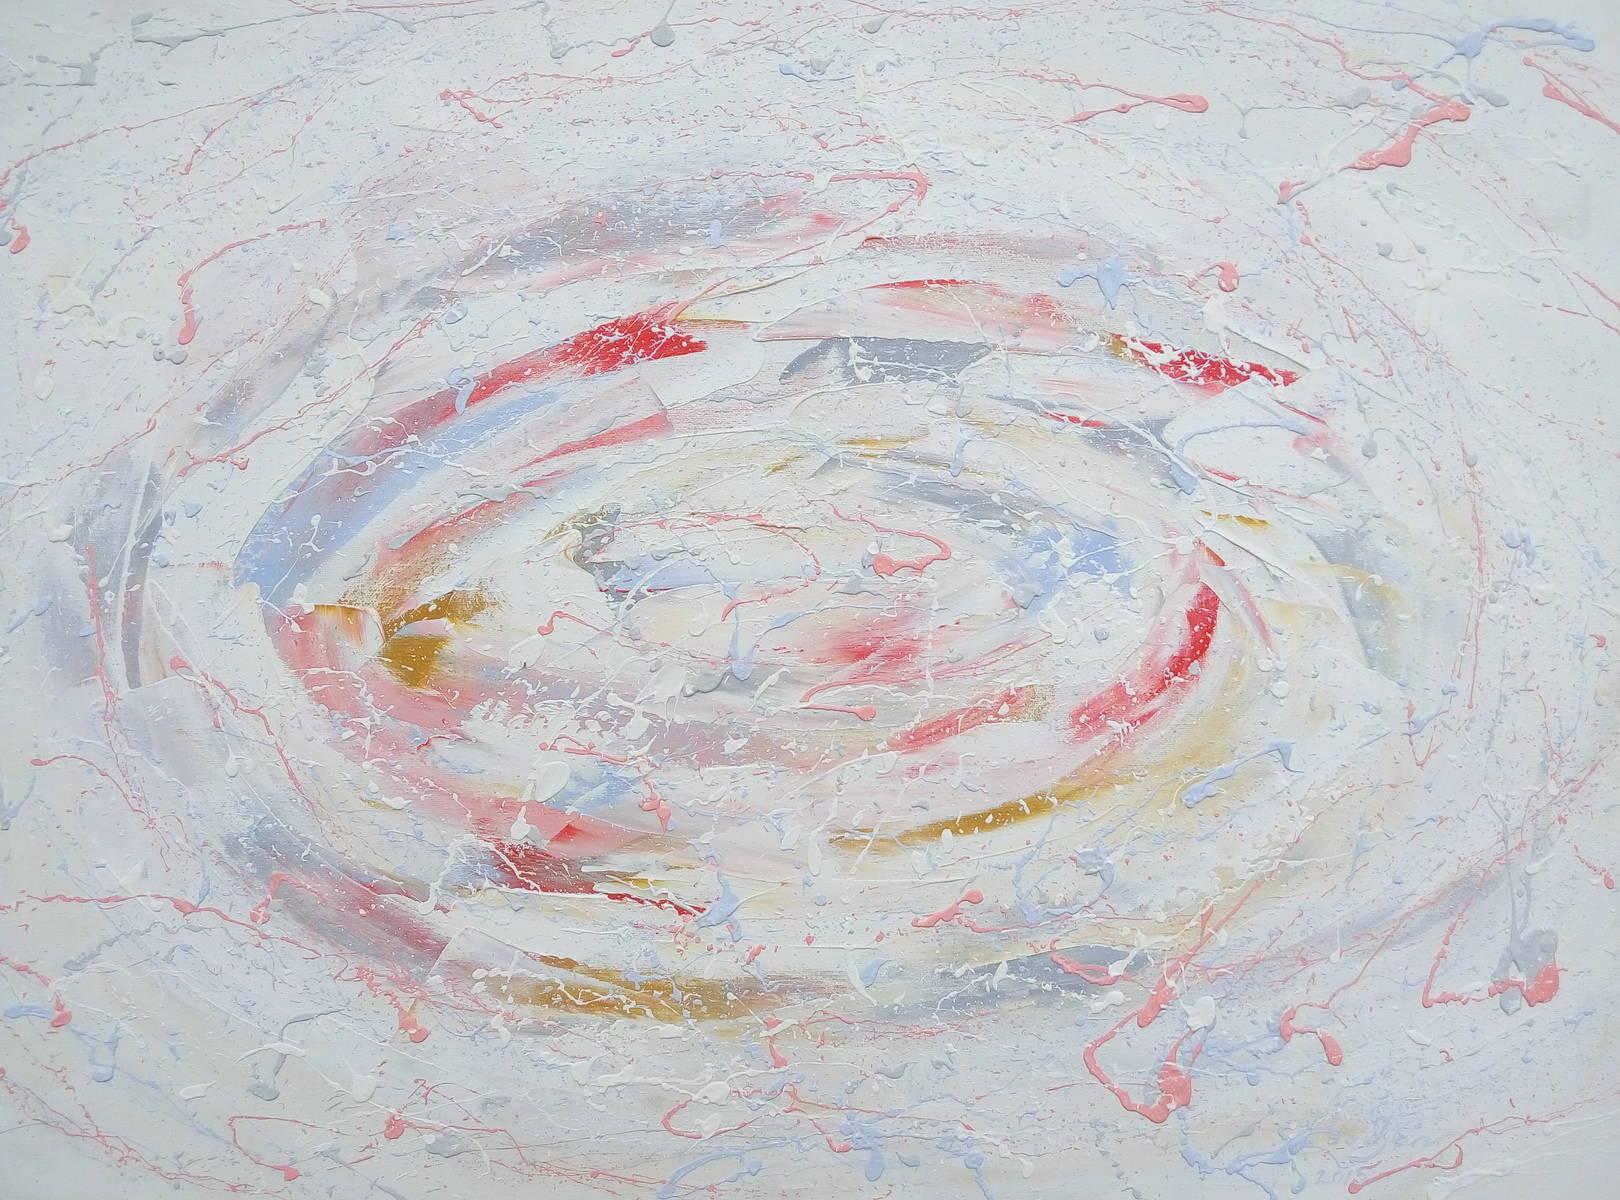 «Белая бесконечность»        холст, масло «White infinity»                       oil on canvas                                                  60x80,  2015